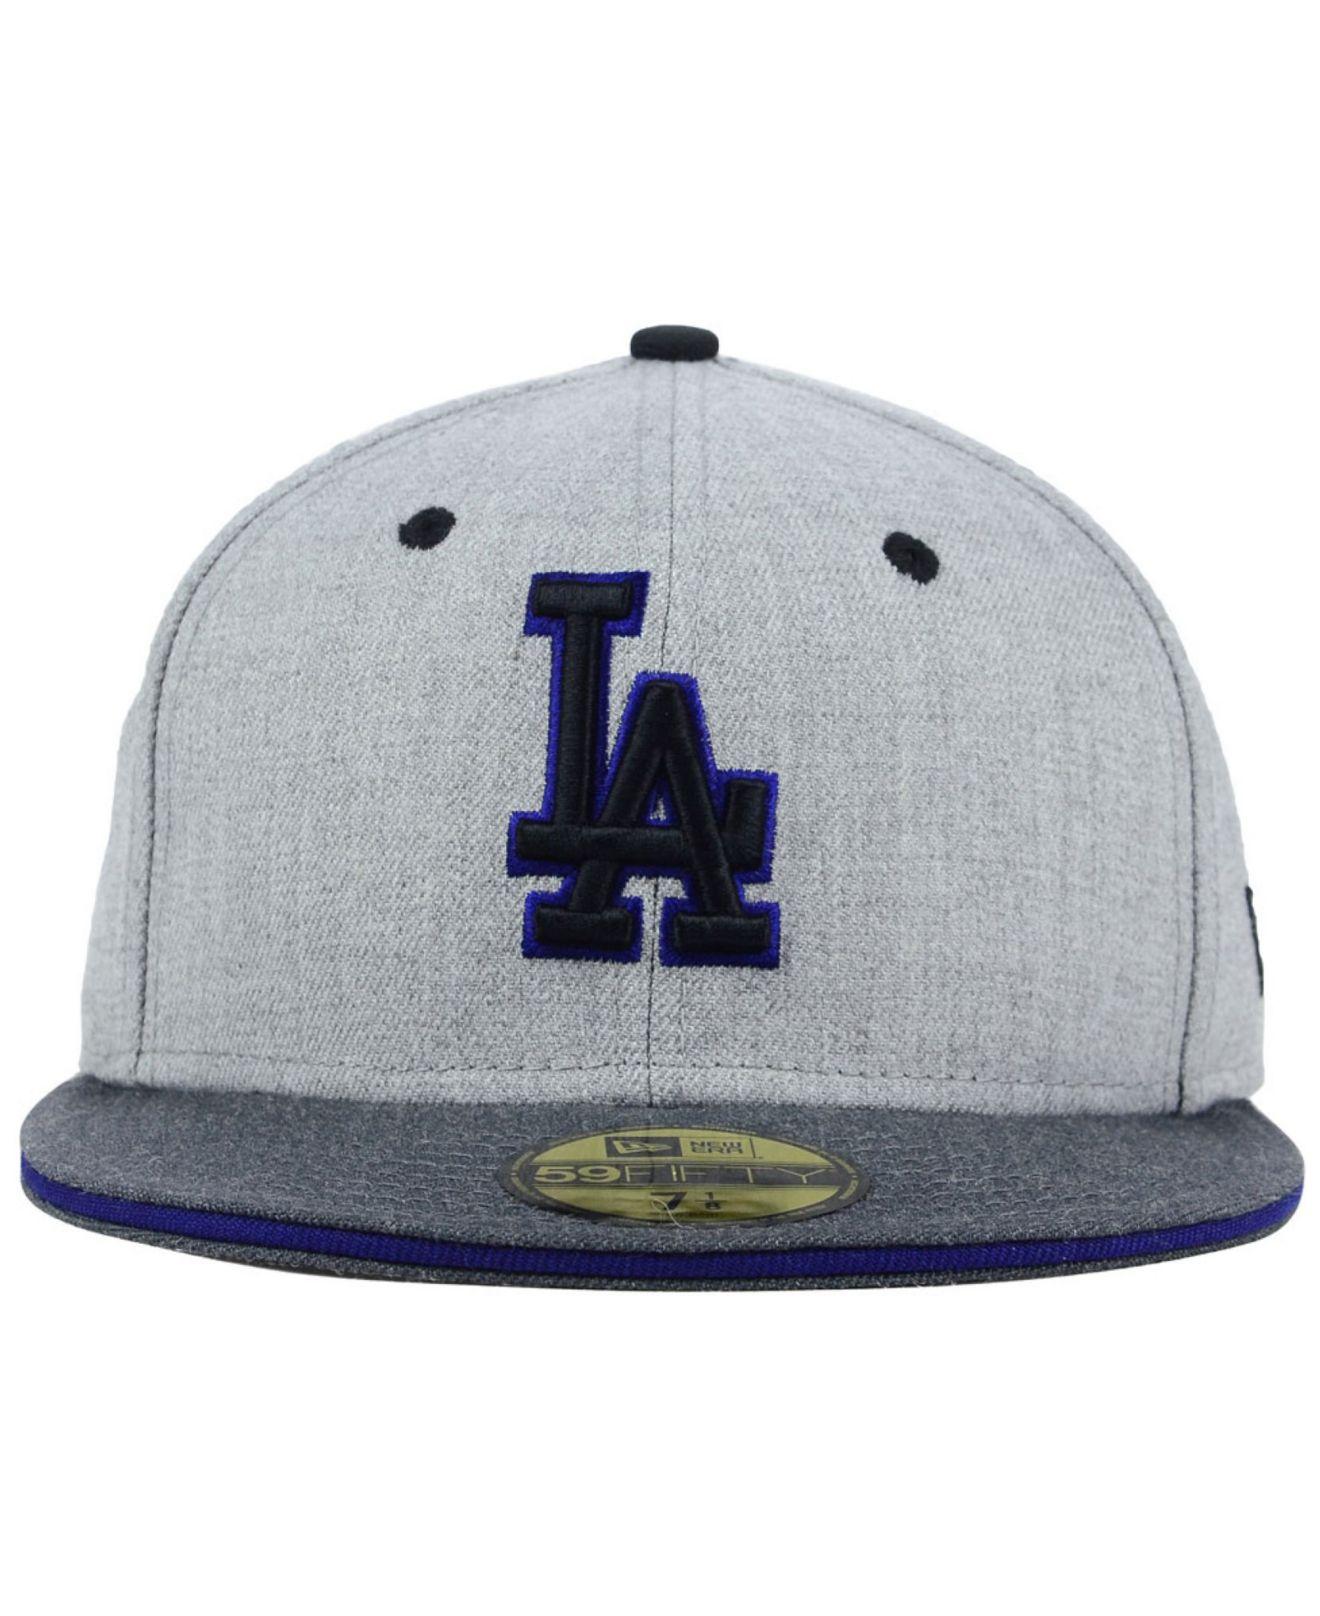 Lyst - KTZ Los Angeles Dodgers Heather Shadow 59fifty Cap in Gray for Men 990337d4bee